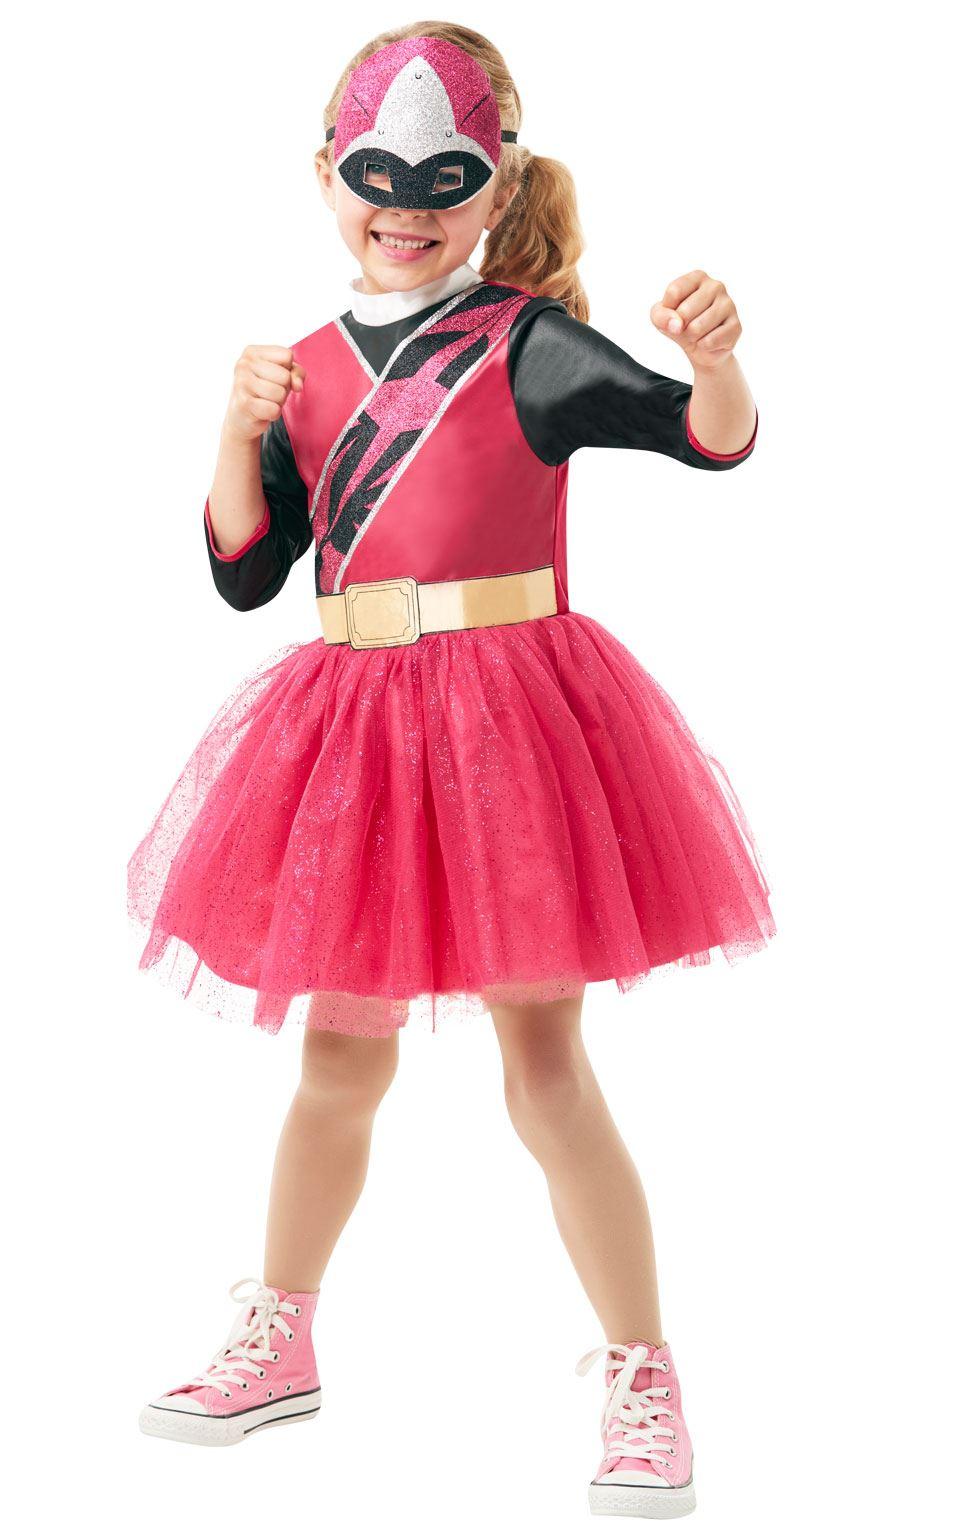 Power Pink Ranger Girls Costume Ninja Steel Fancy Dress Outfit official licensed